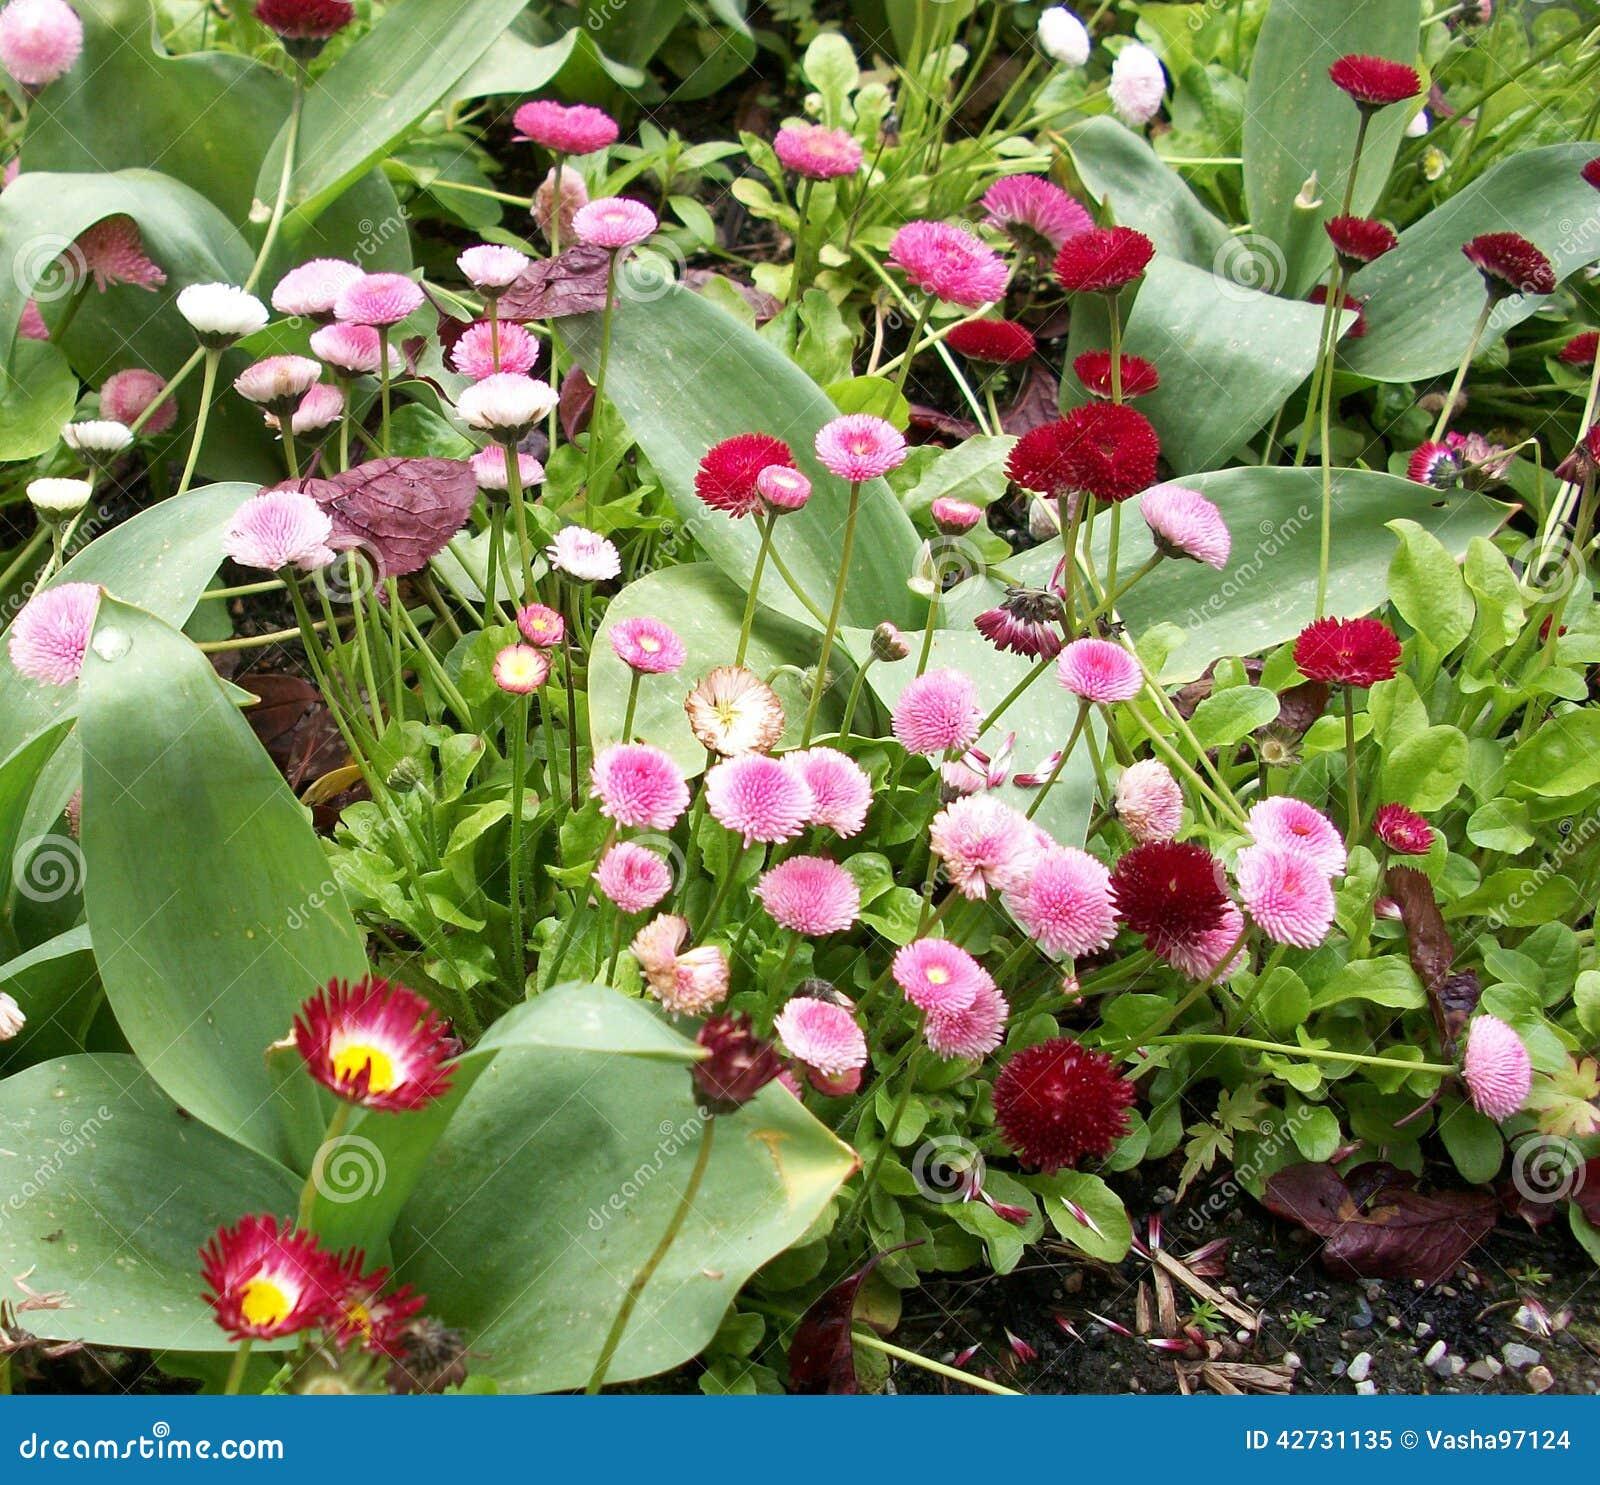 English daisies stock image image of daisies flowers 42731135 download english daisies stock image image of daisies flowers 42731135 izmirmasajfo